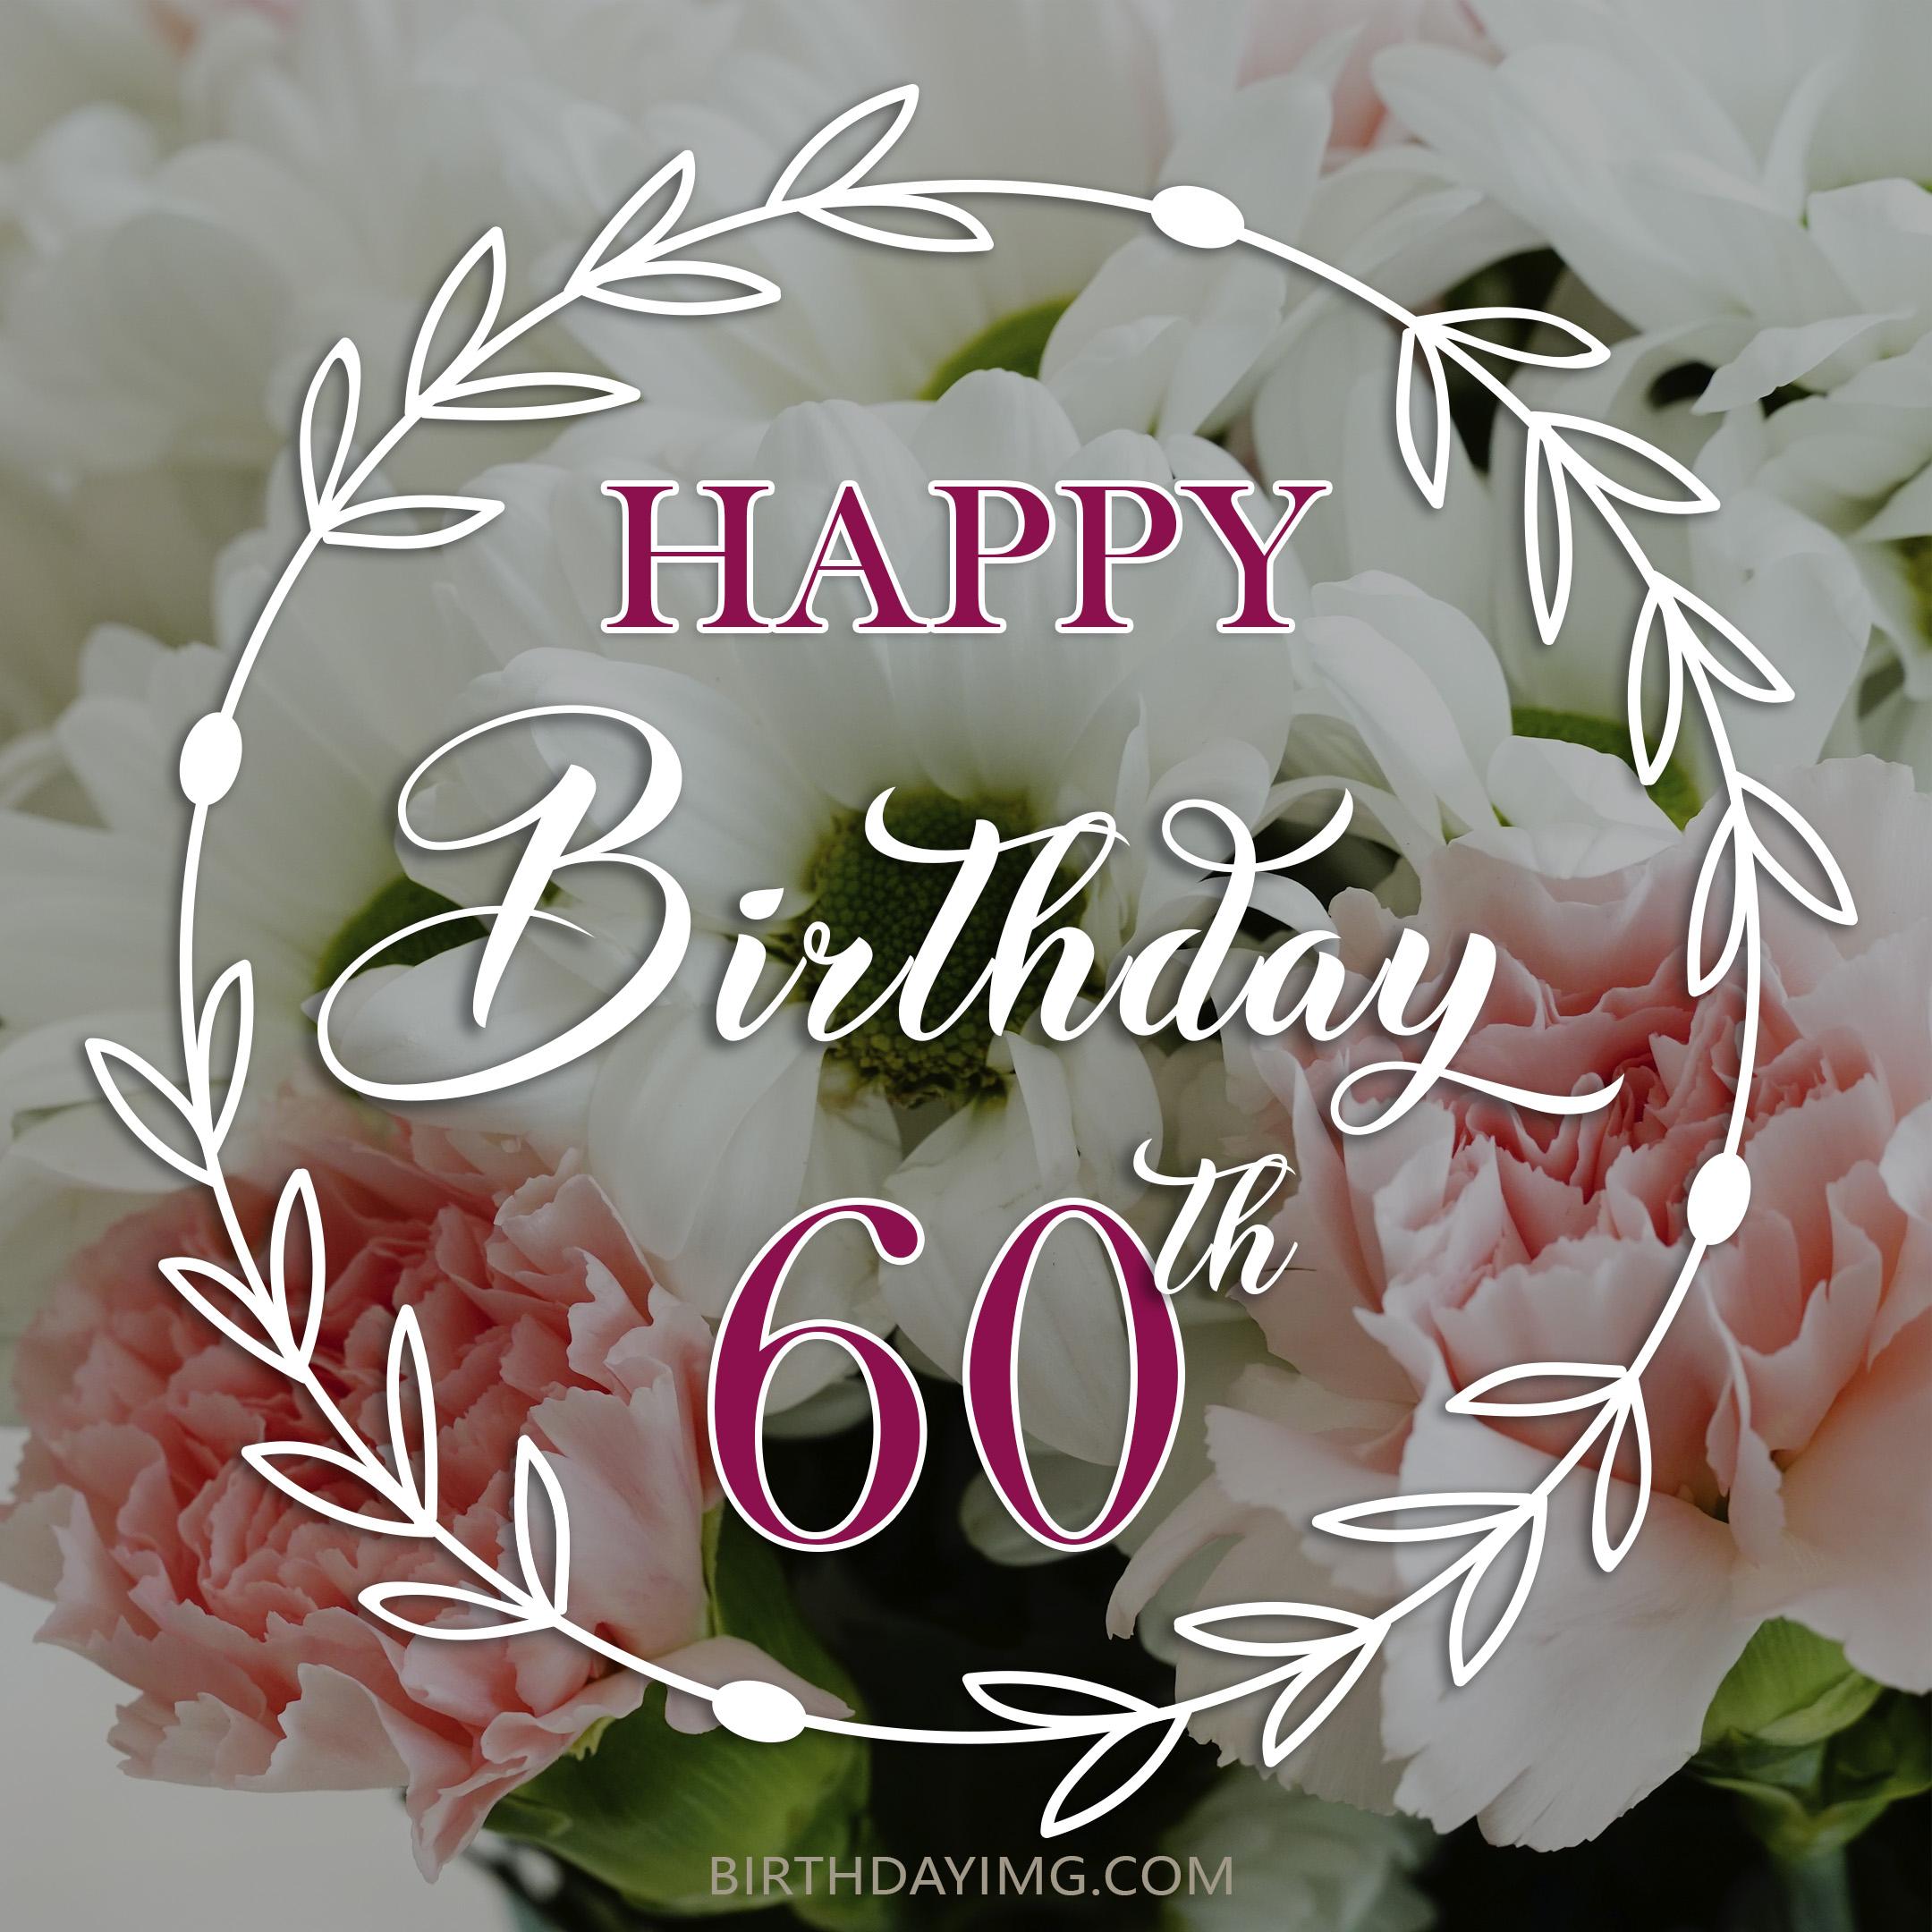 Free 60th Years Happy Birthday Image With Beautiful Flowers - birthdayimg.com